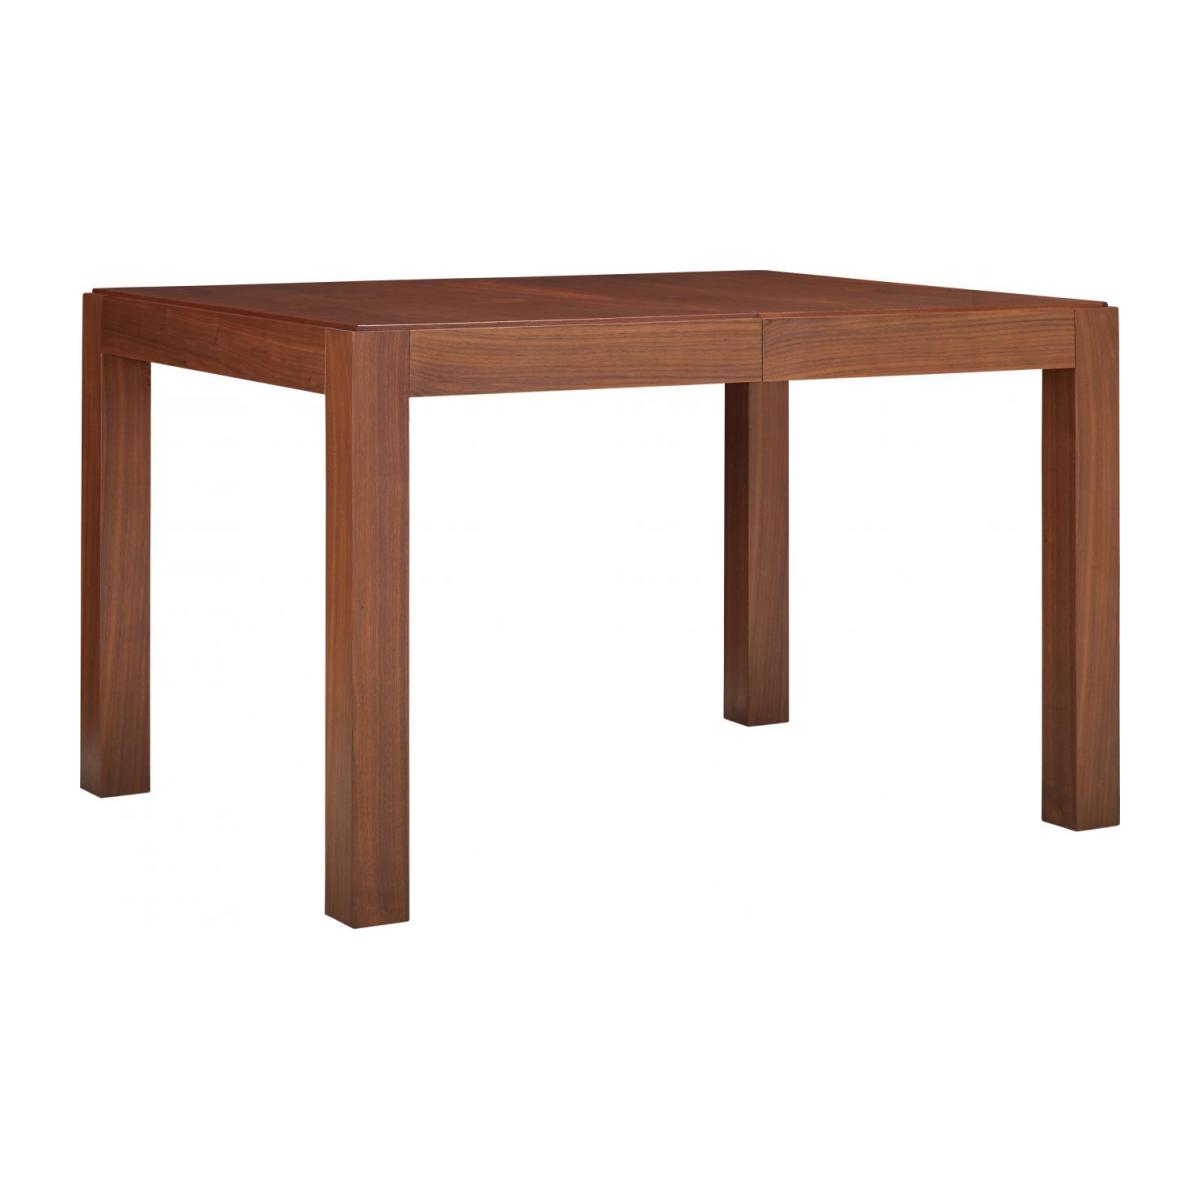 Table À Manger Avec Rallonges - Noyer dedans Table Salle À Manger Habitat